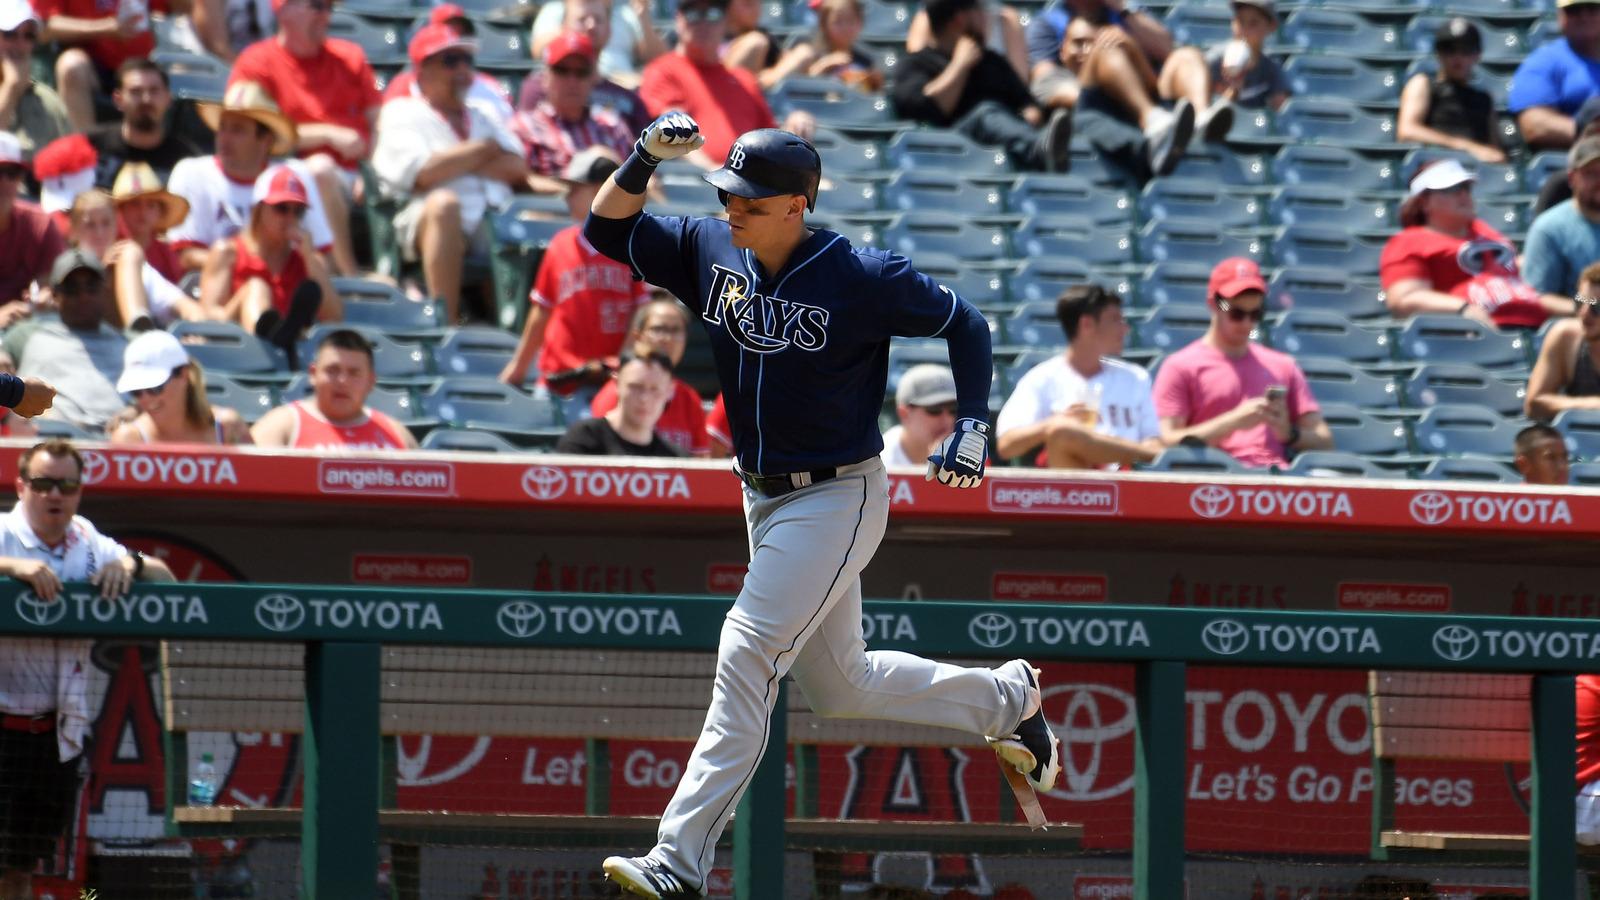 Logan Morrison delivered one of the year's best bat flips ...